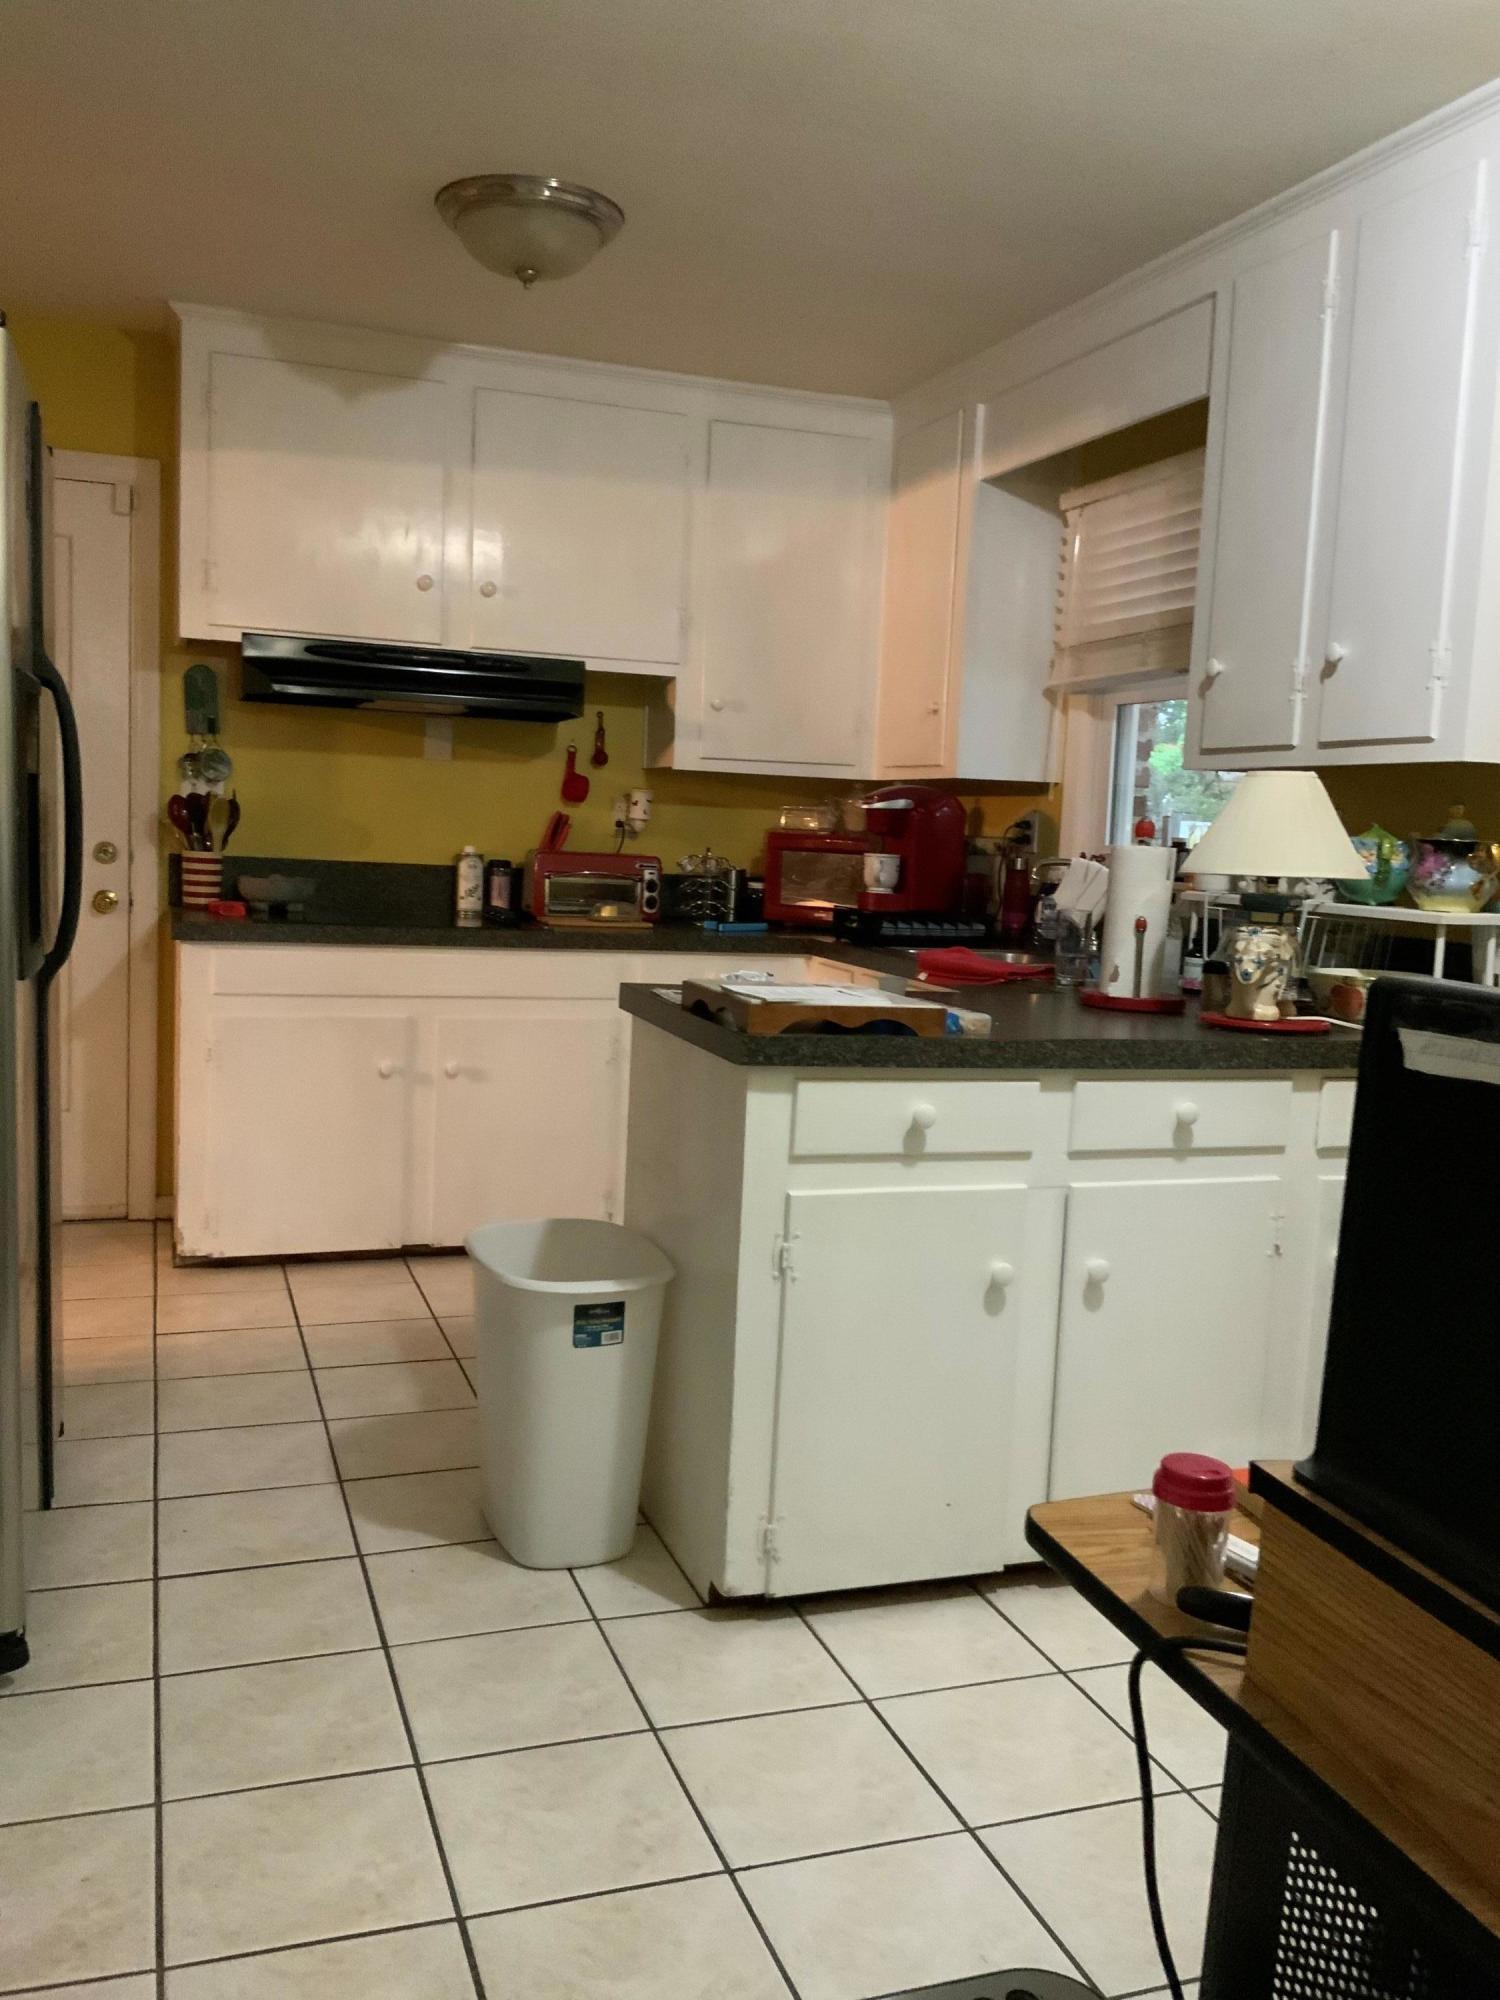 Northbridge Terrace Homes For Sale - 1156 Northbridge, Charleston, SC - 11